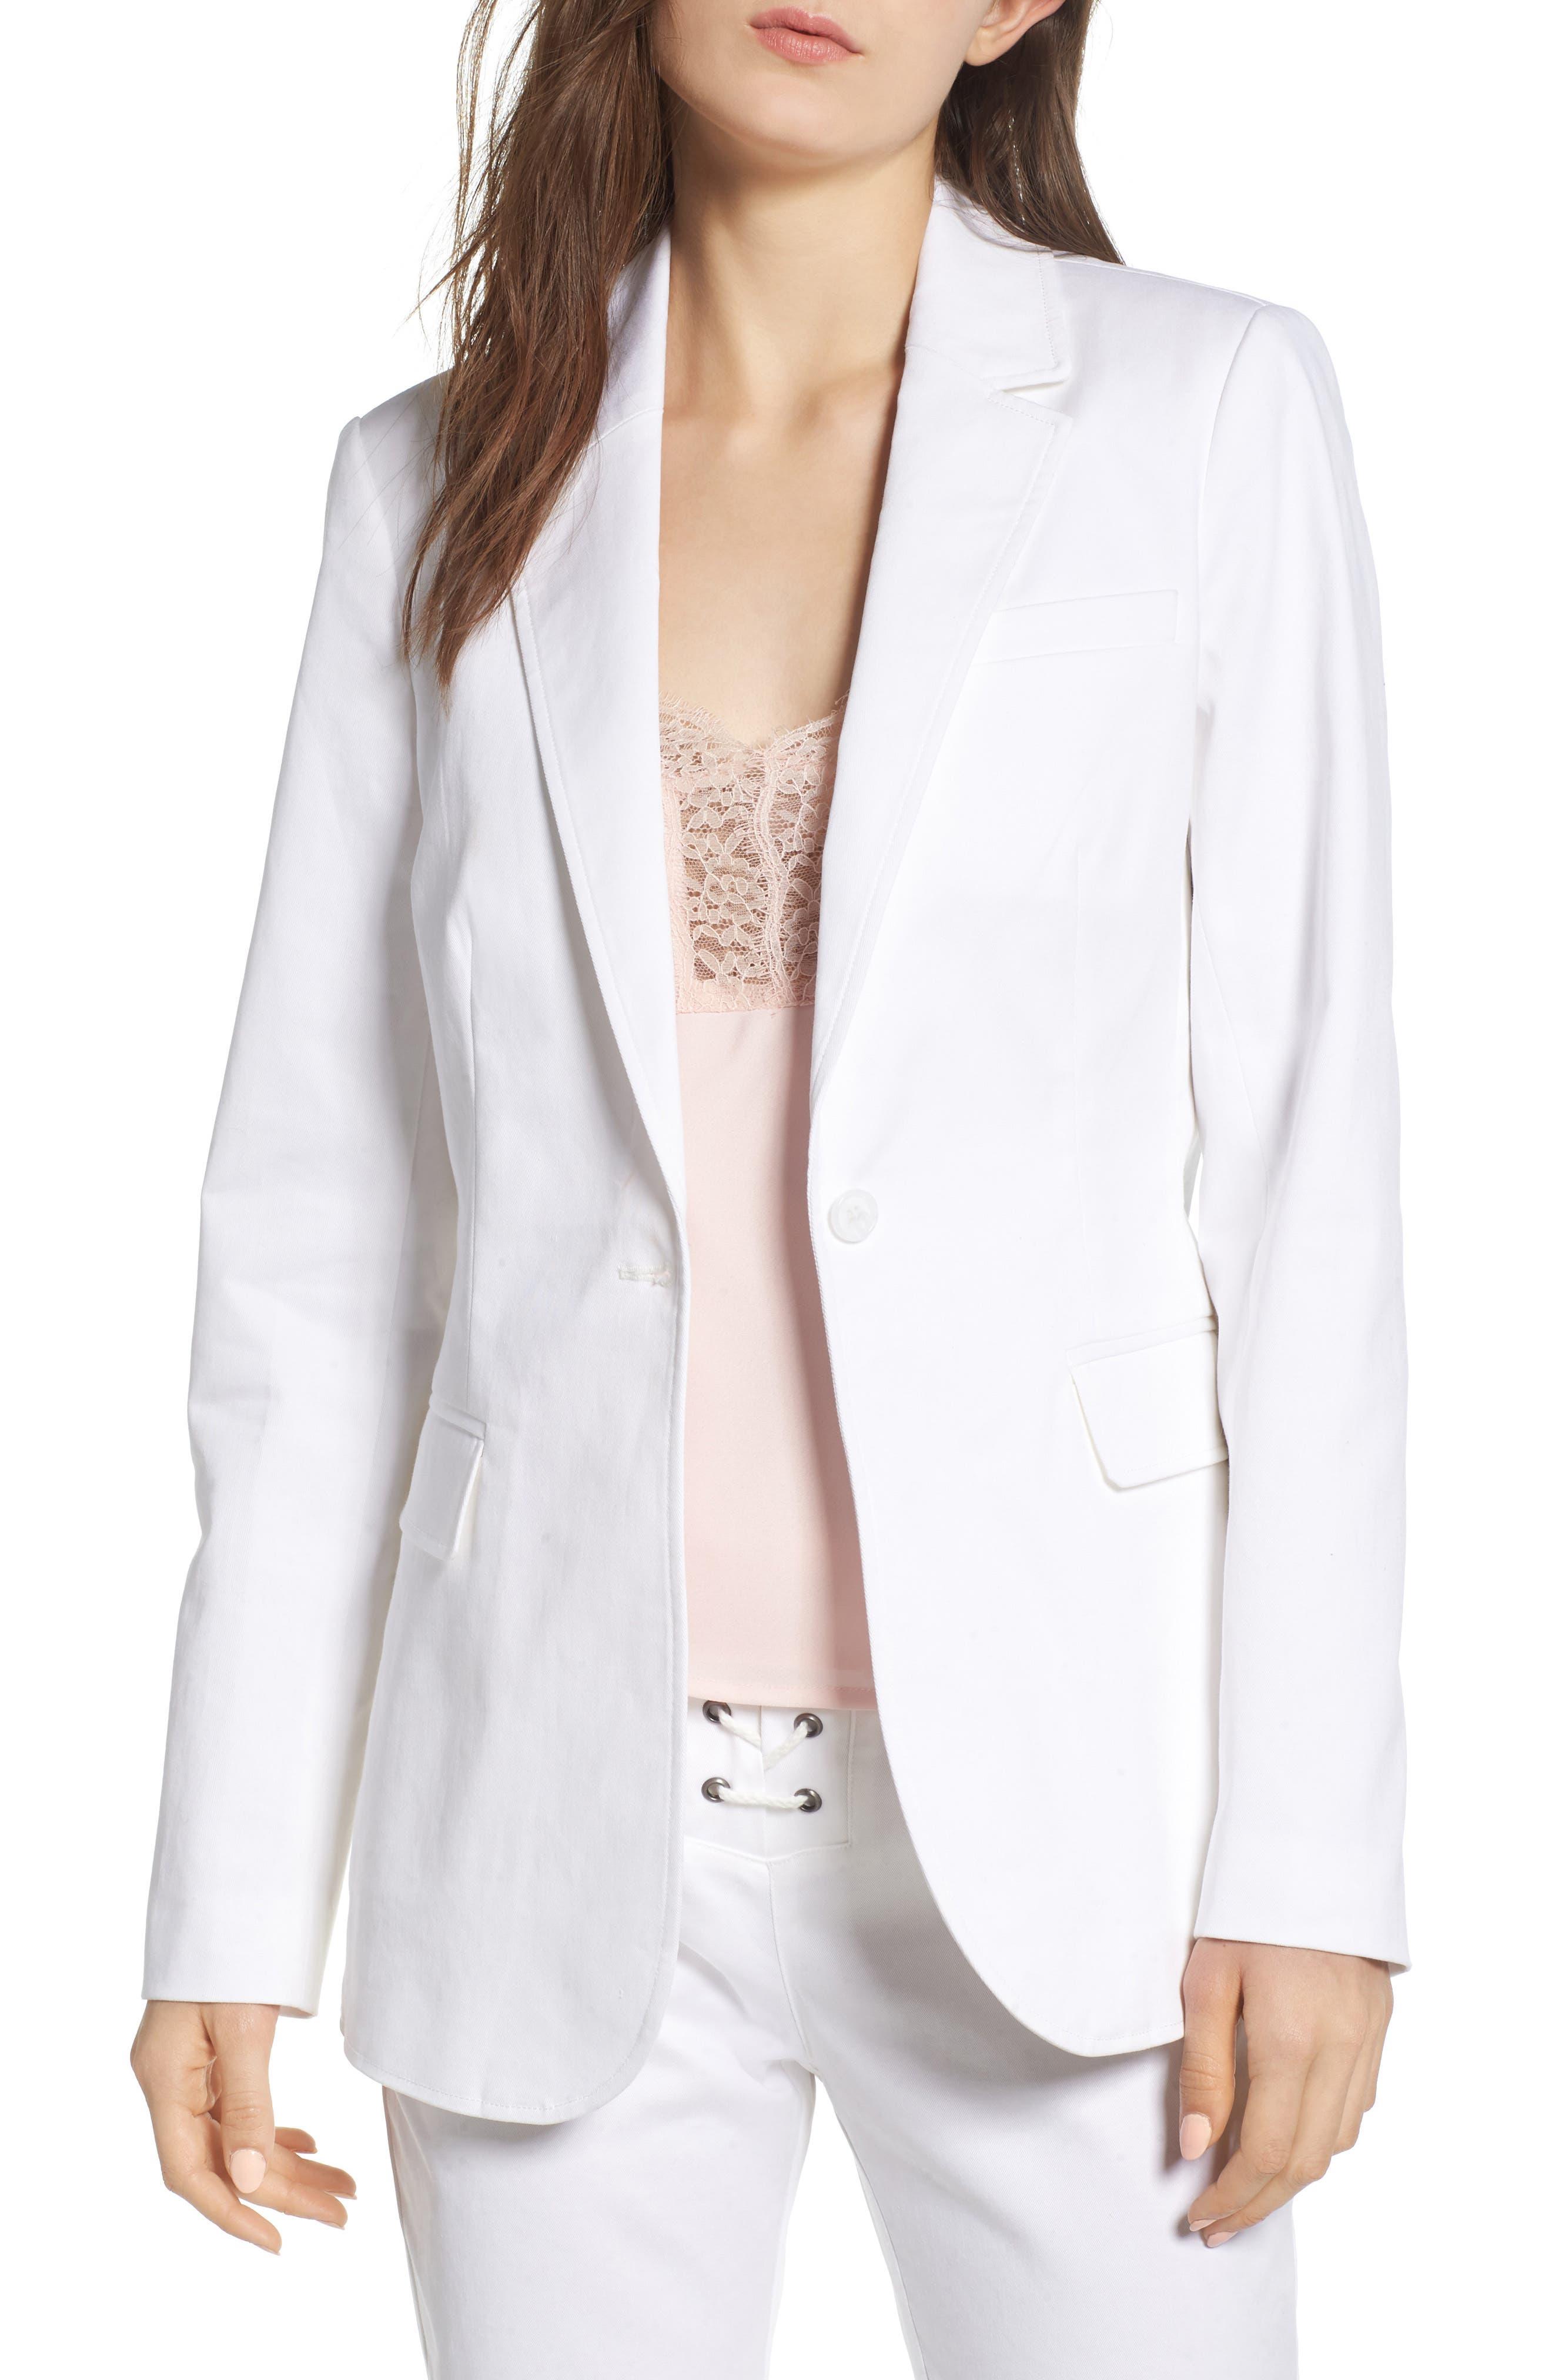 Merilee Jacket,                             Main thumbnail 1, color,                             White